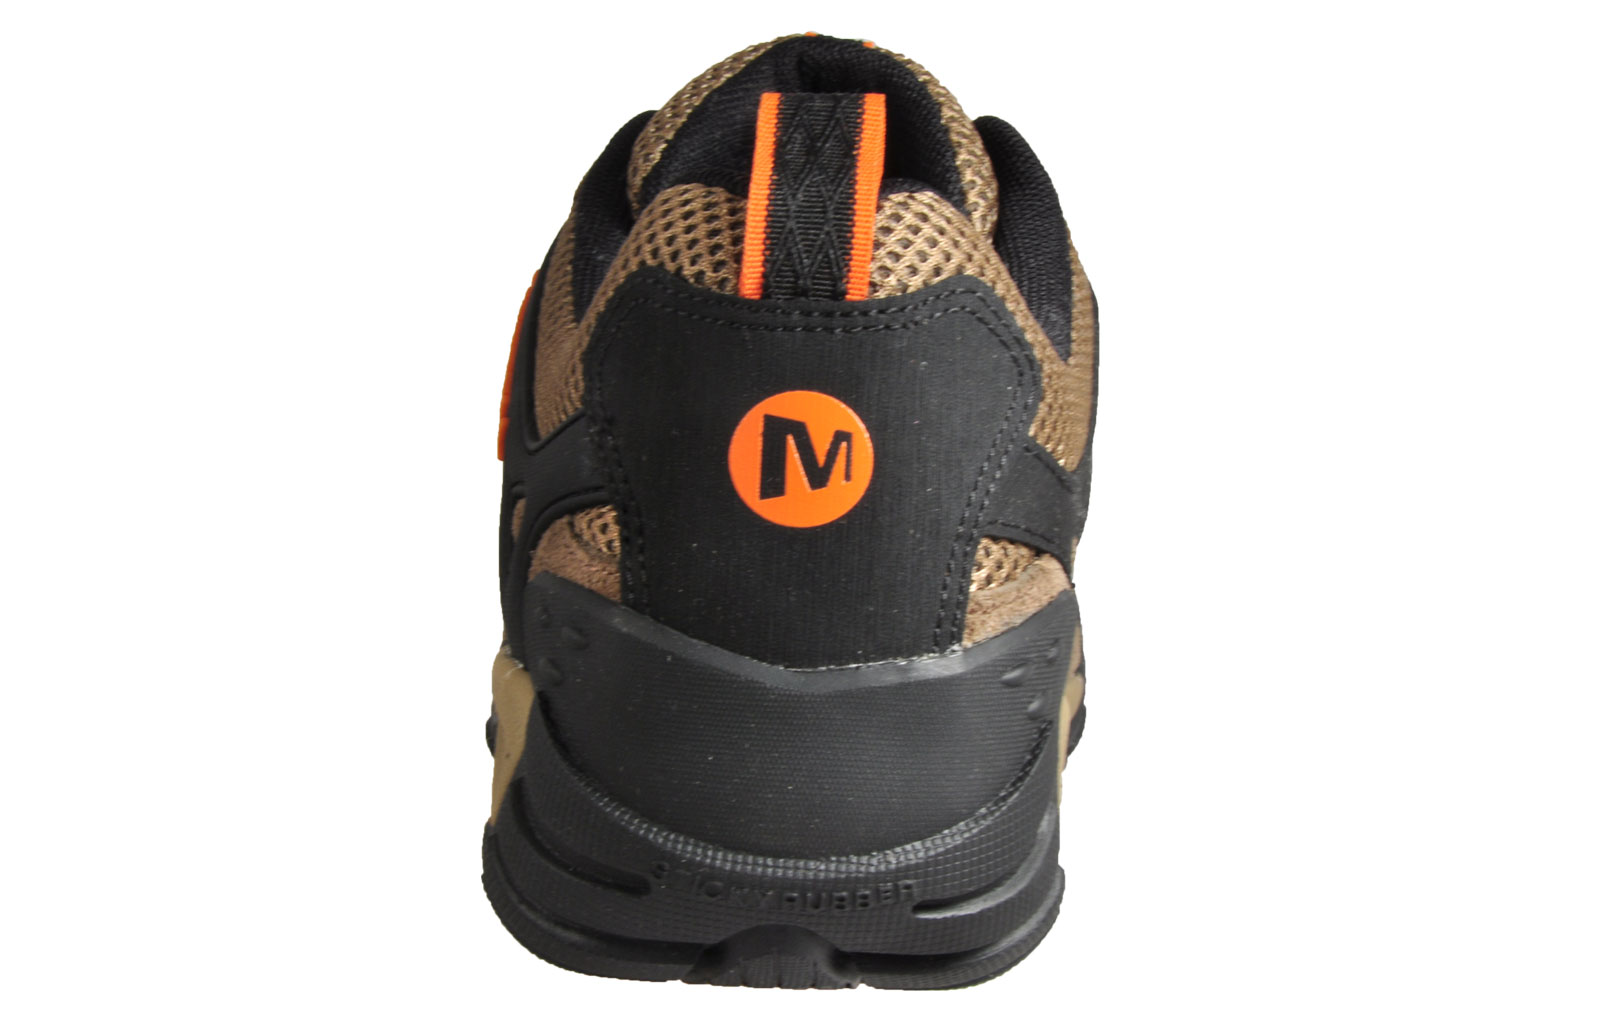 3bfbc3415cb5 Merrell Yokota Ascender Ventilator Men s Walking Hiking Outdoor Shoes Brown